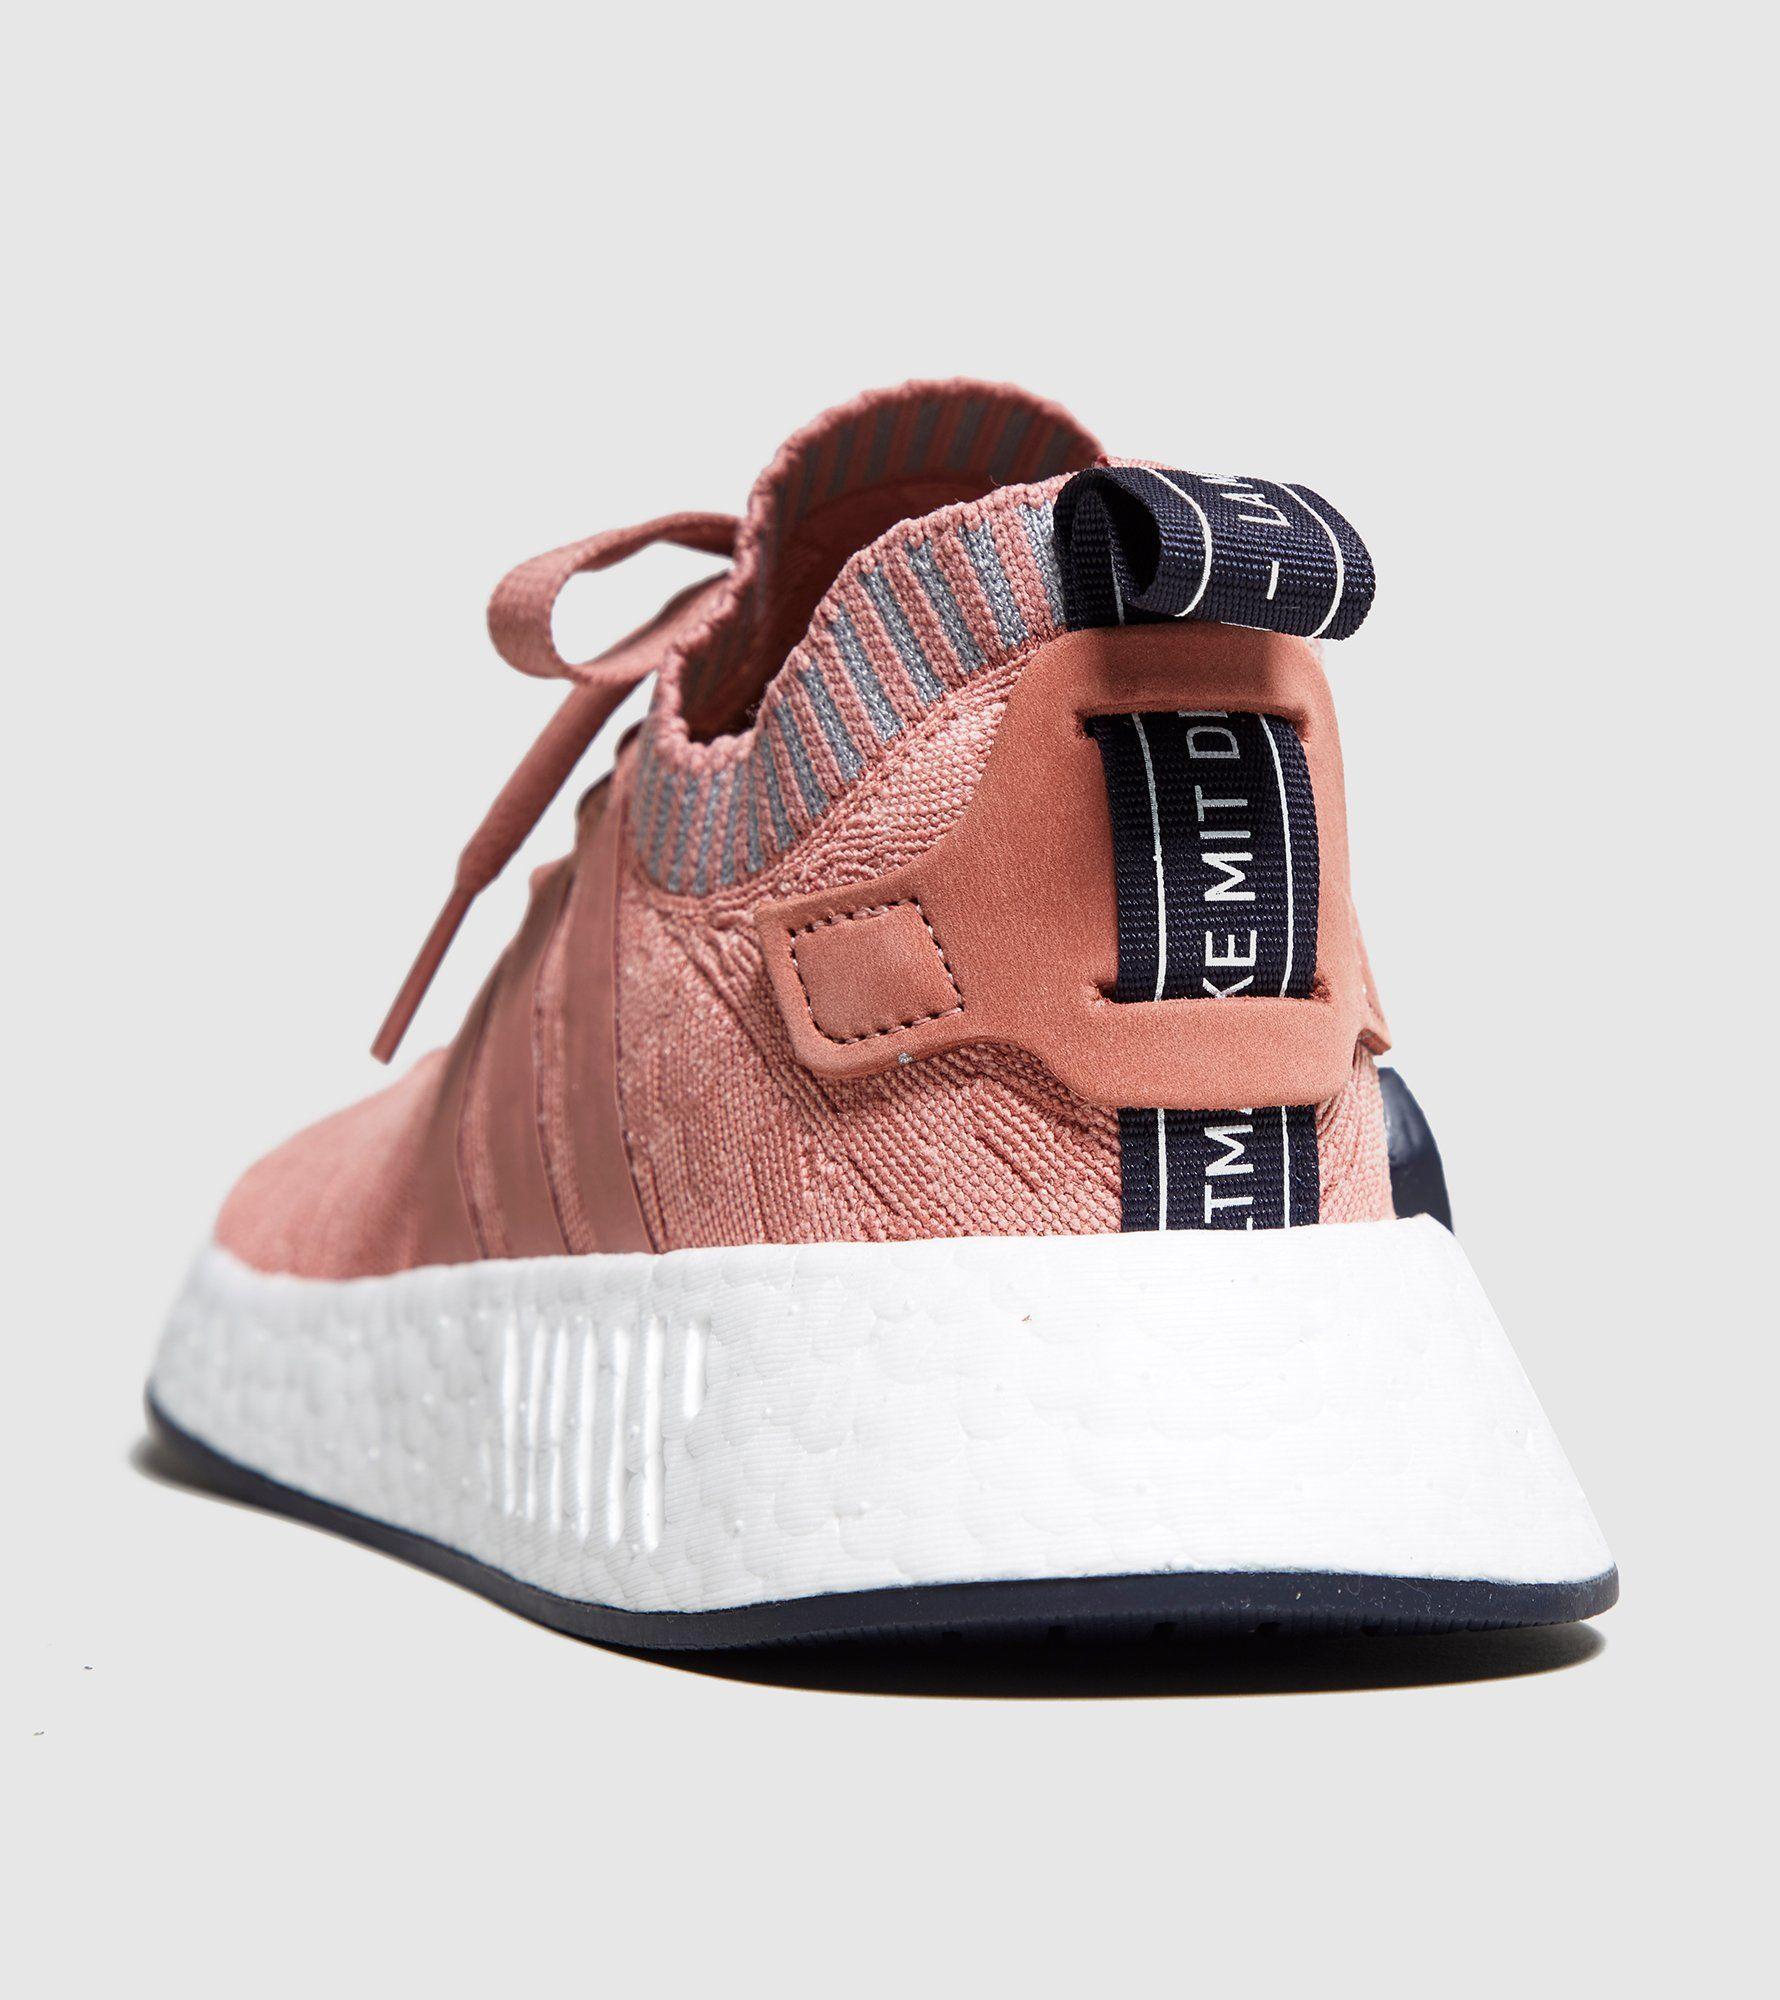 adidas Originals NMD R2 Women's